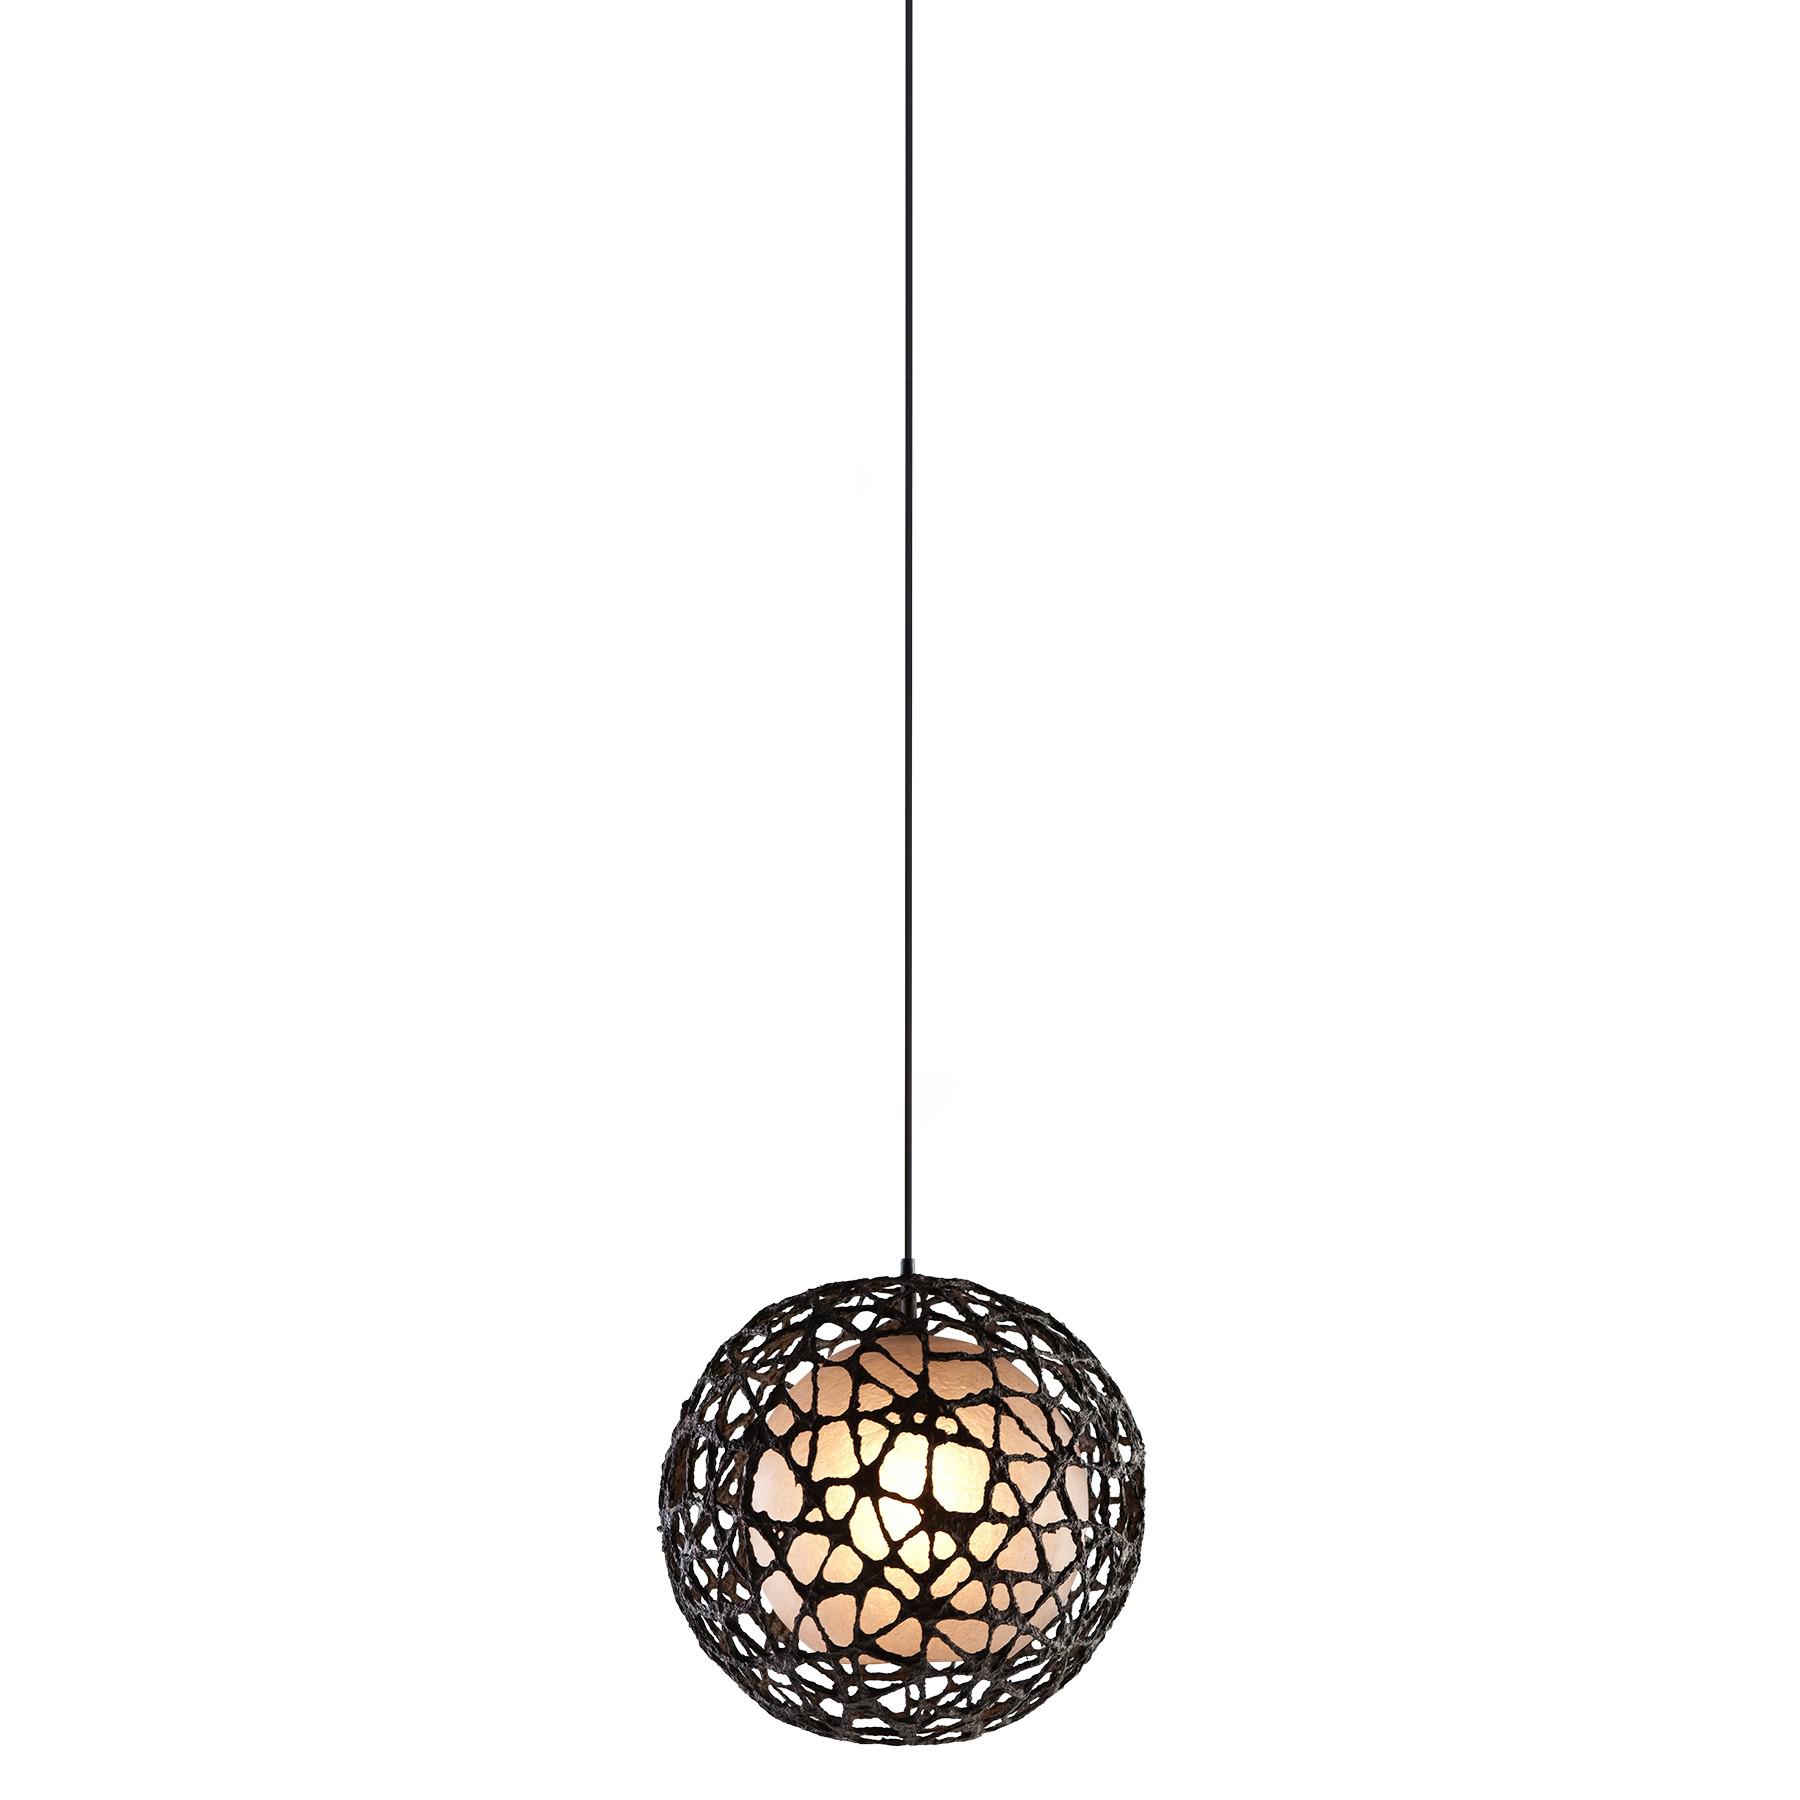 Hanging Light PNG Images Transparent Free Download.